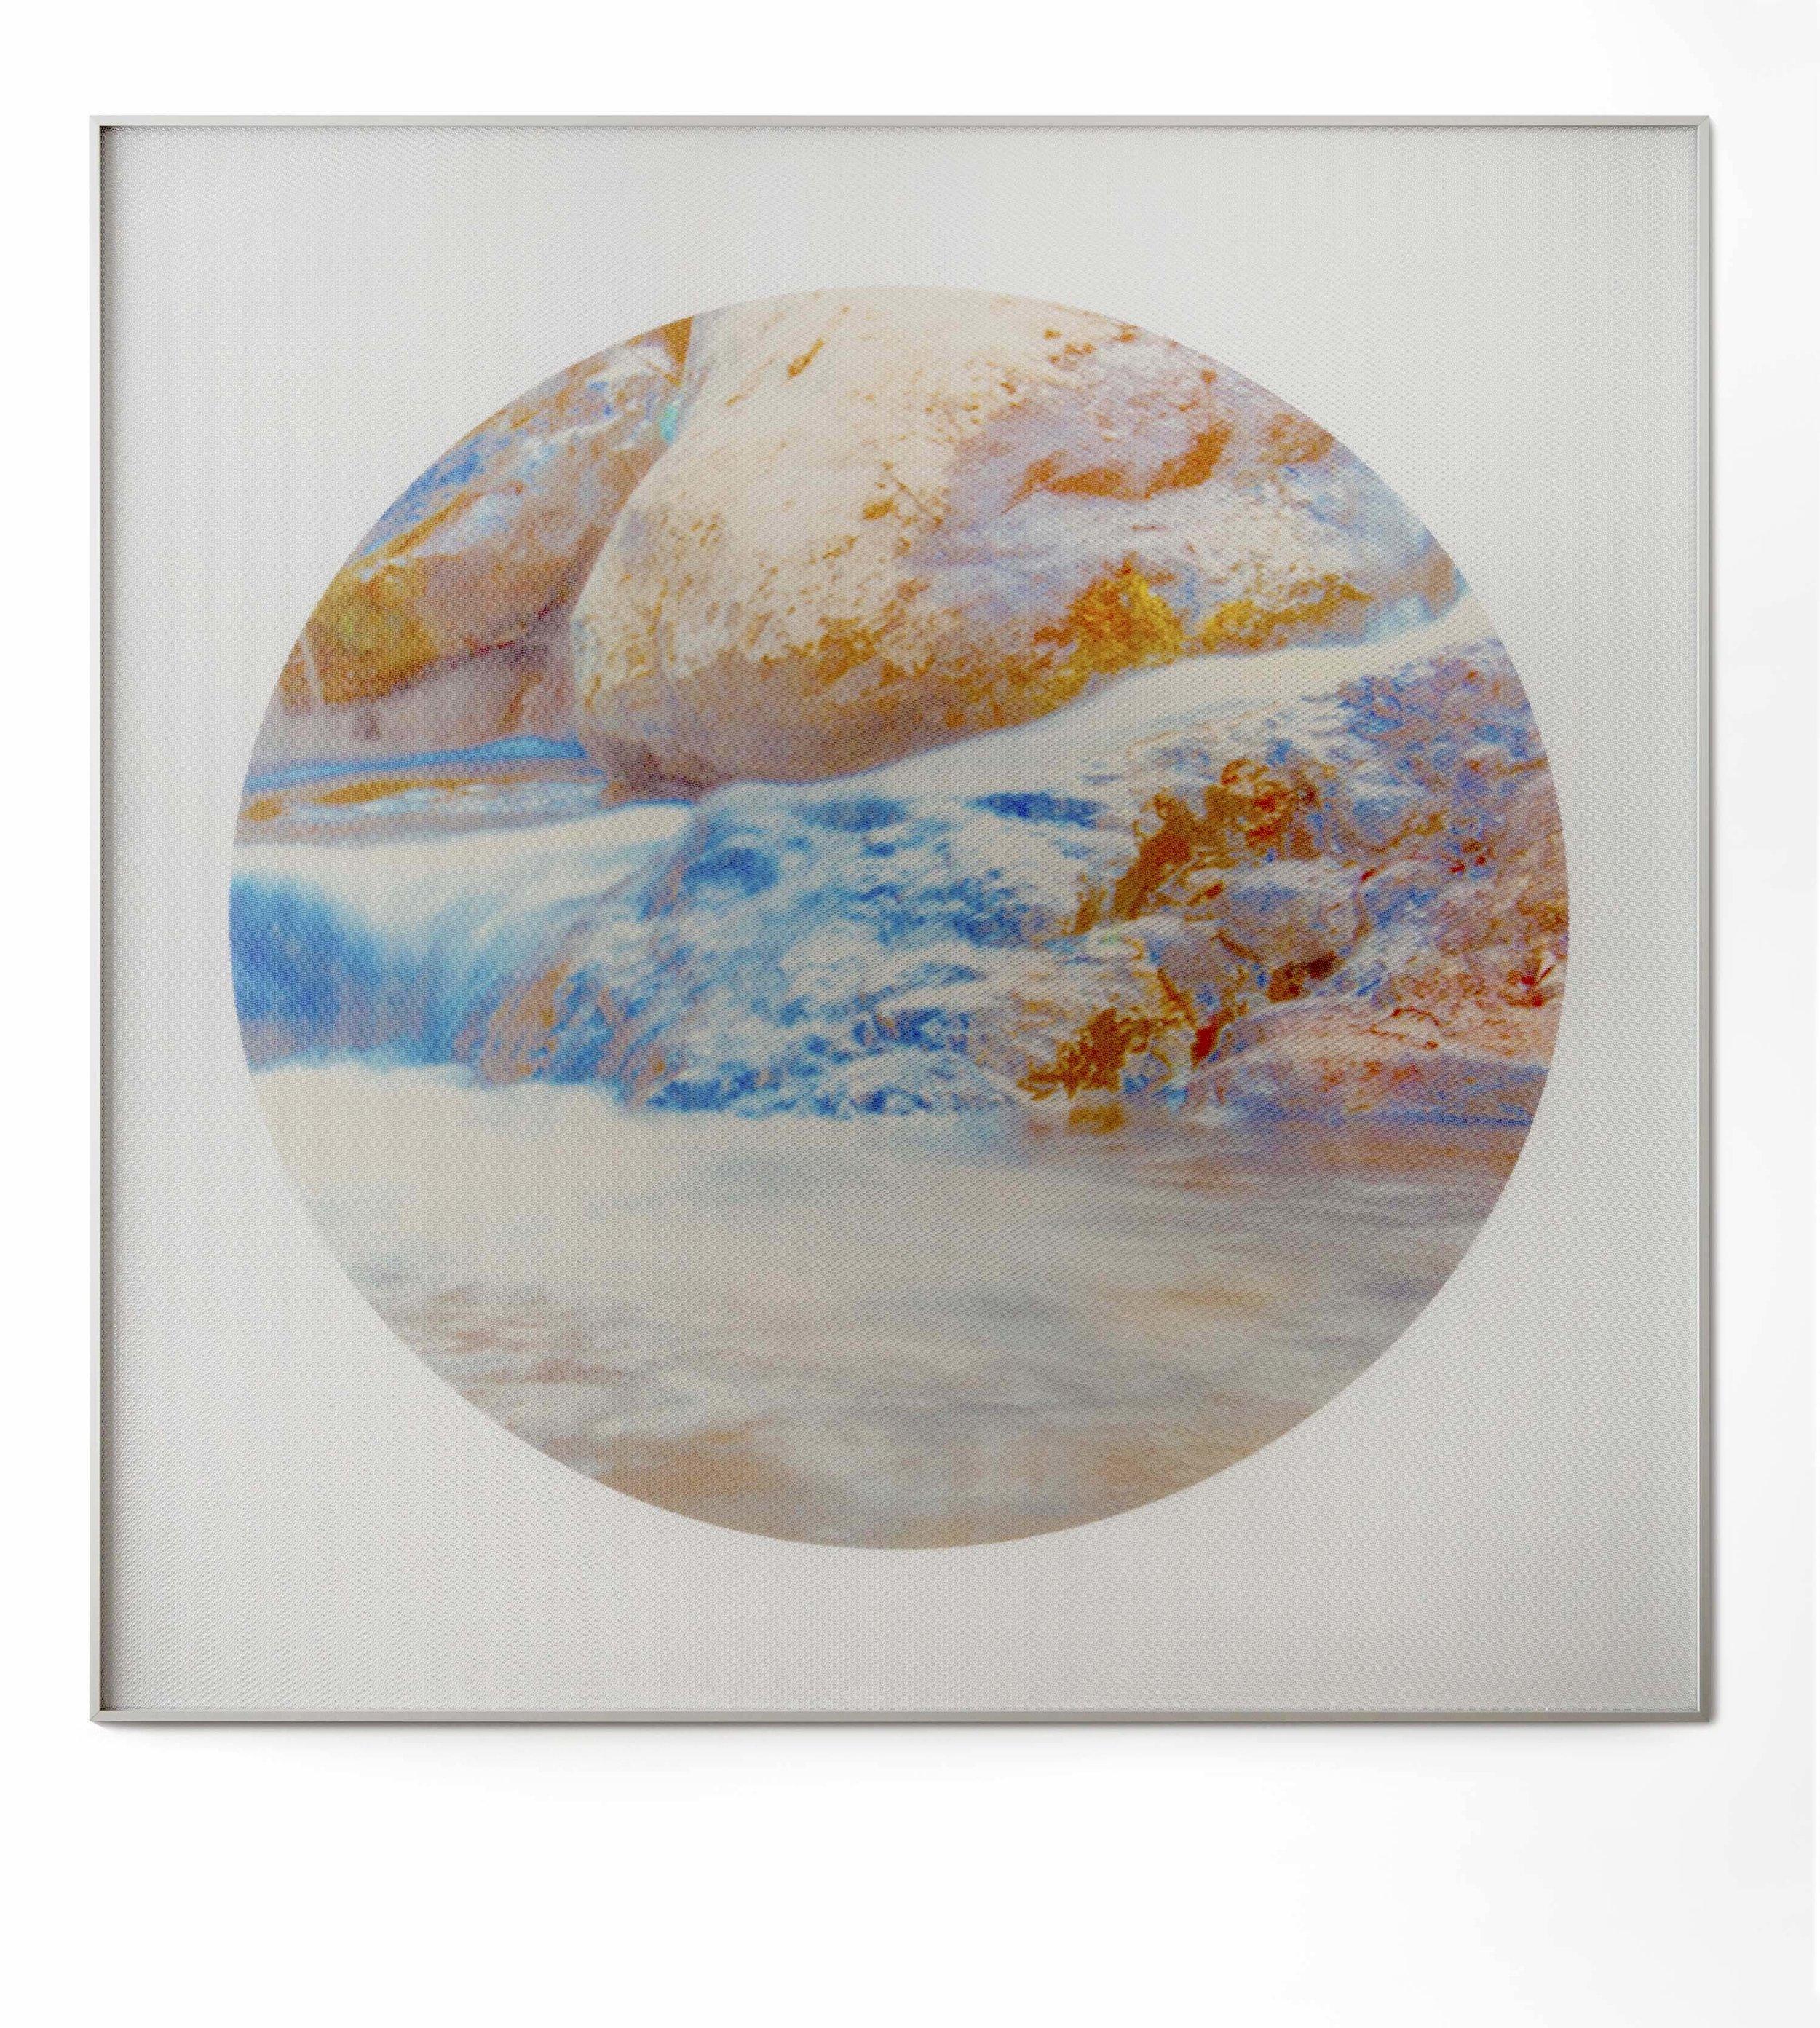 Beyond the Oecumene / Part XXVIII,  2019 Aquarelle, wax pastels, UV-print on mirror beneath structured Plexiglas 120 x 120 cm (47 x 47 in)